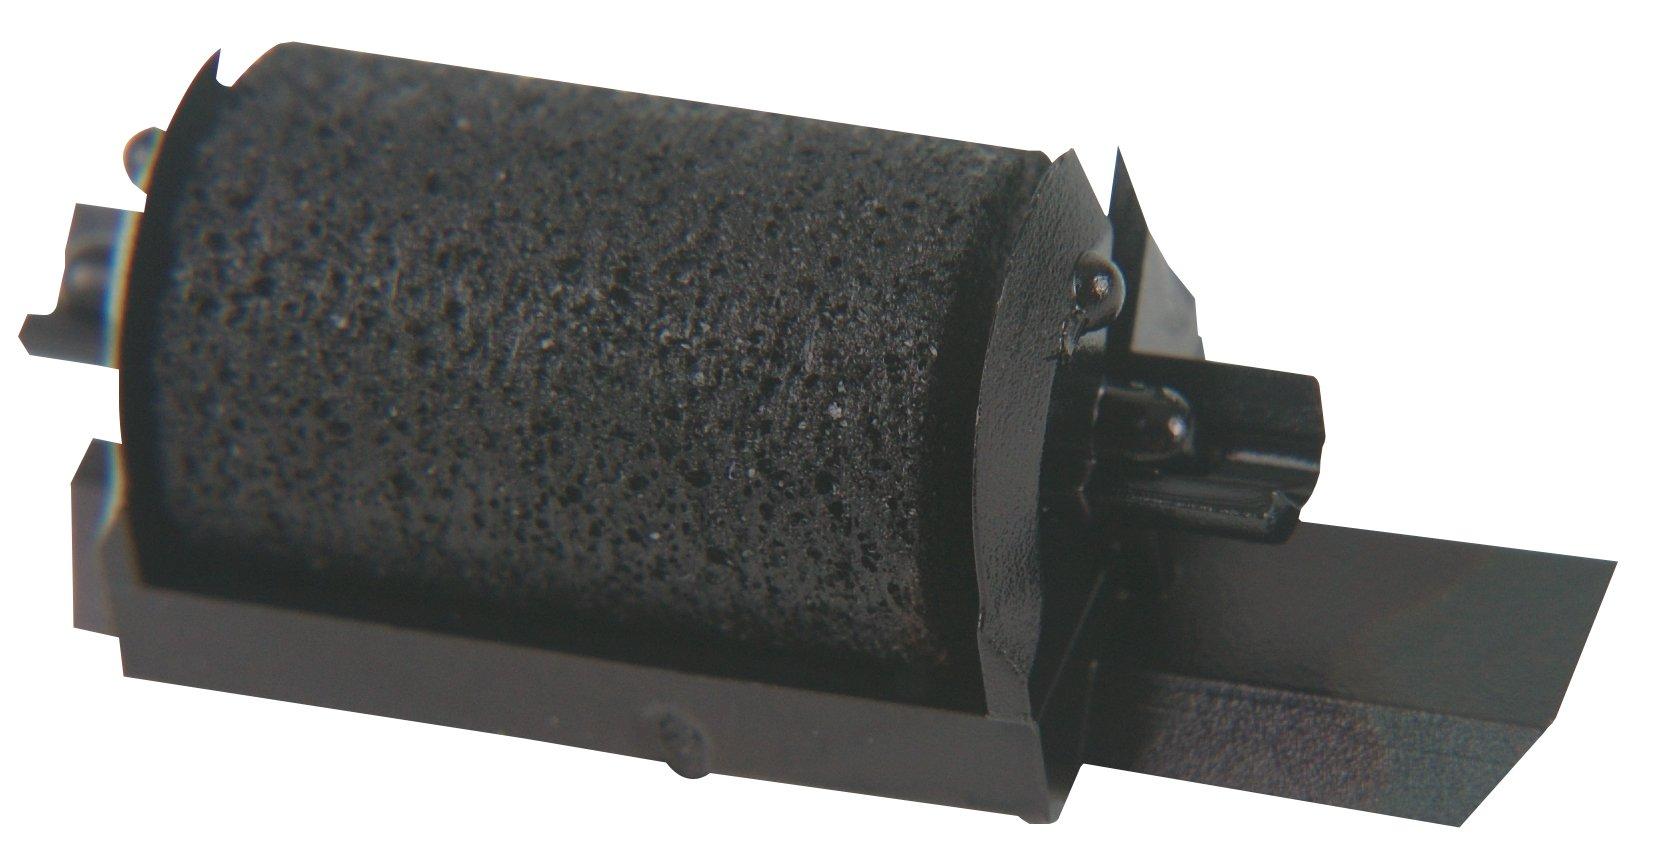 Porelon 11202 PR40 Calculator Ink Roll, 1-Pack by Porelon (Image #1)